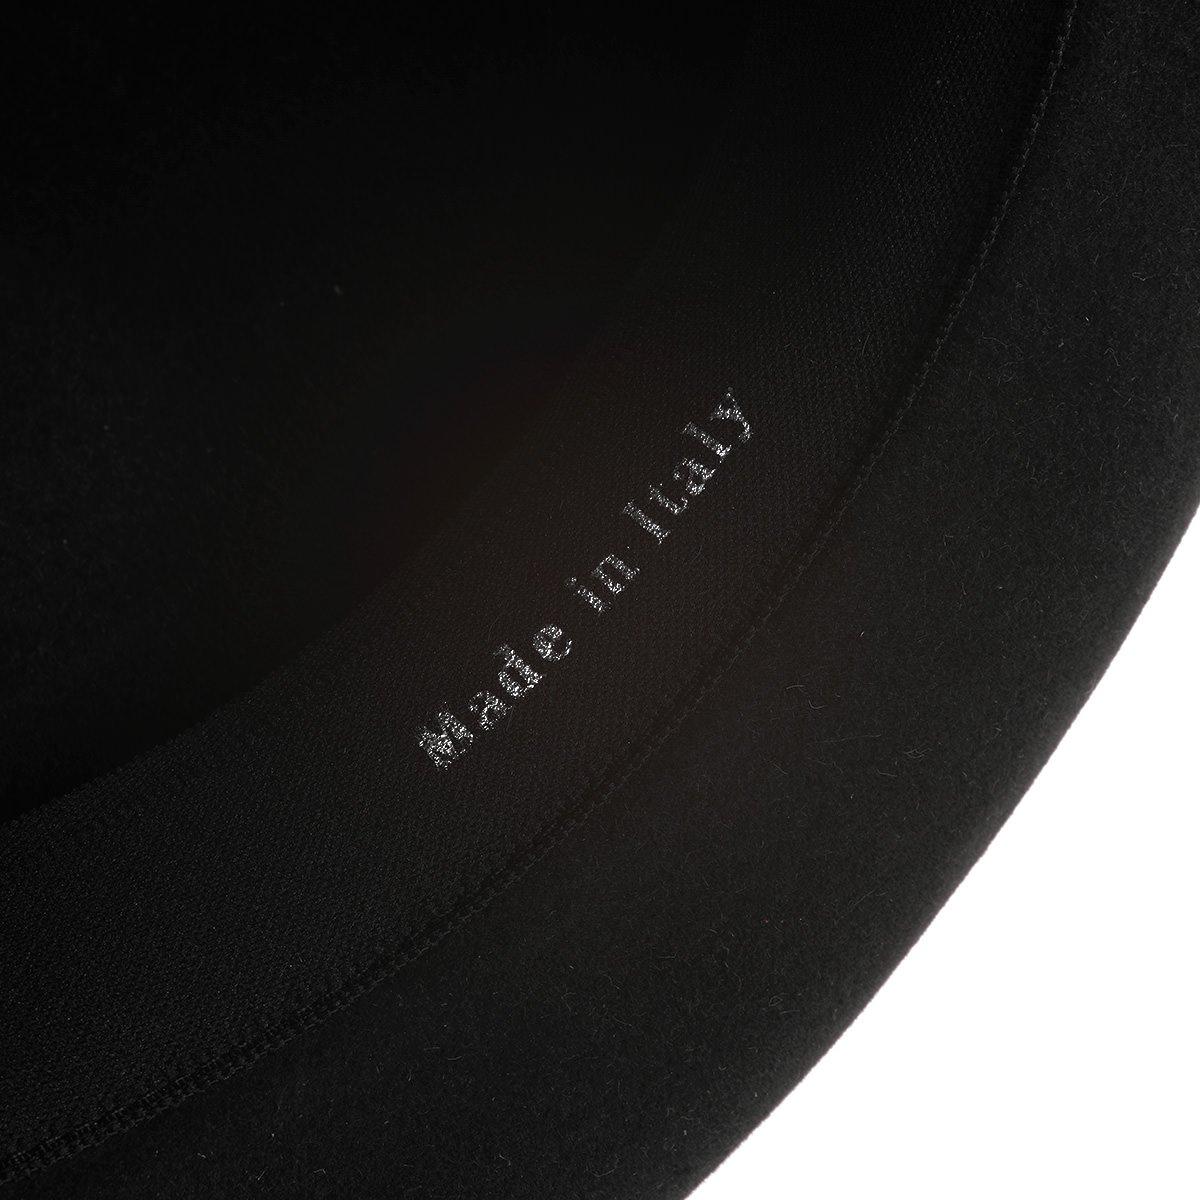 Rohw master product by Tesi AVAN FUR FELT HAT 詳細画像4